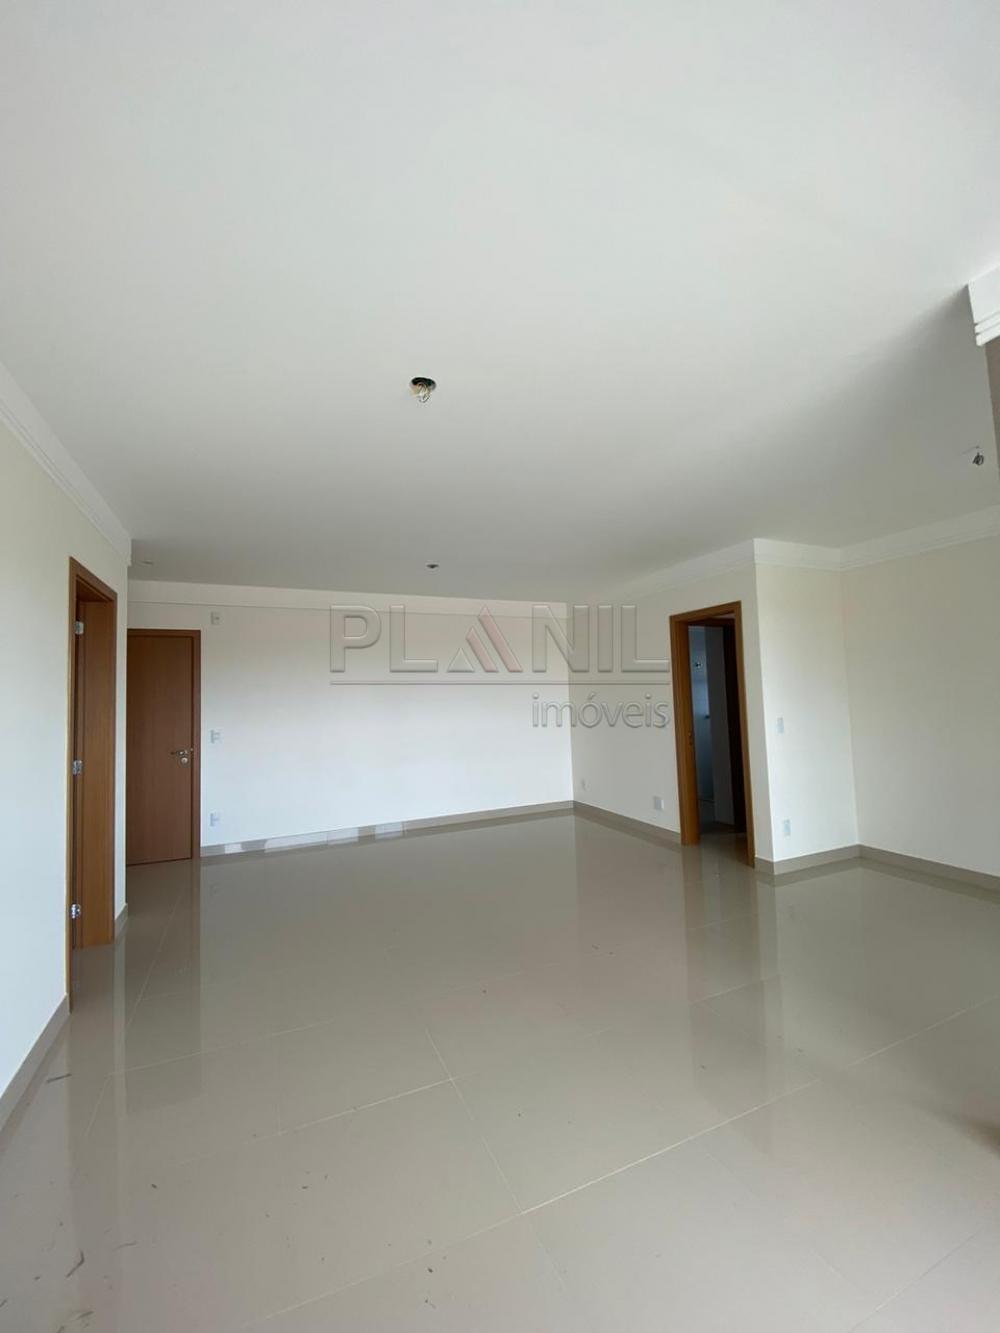 https://static.arboimoveis.com.br/AP1268_PLAN/apartamento-a-venda-jardim-iraja-ribeirao-preto1617244283089lkjby.jpg